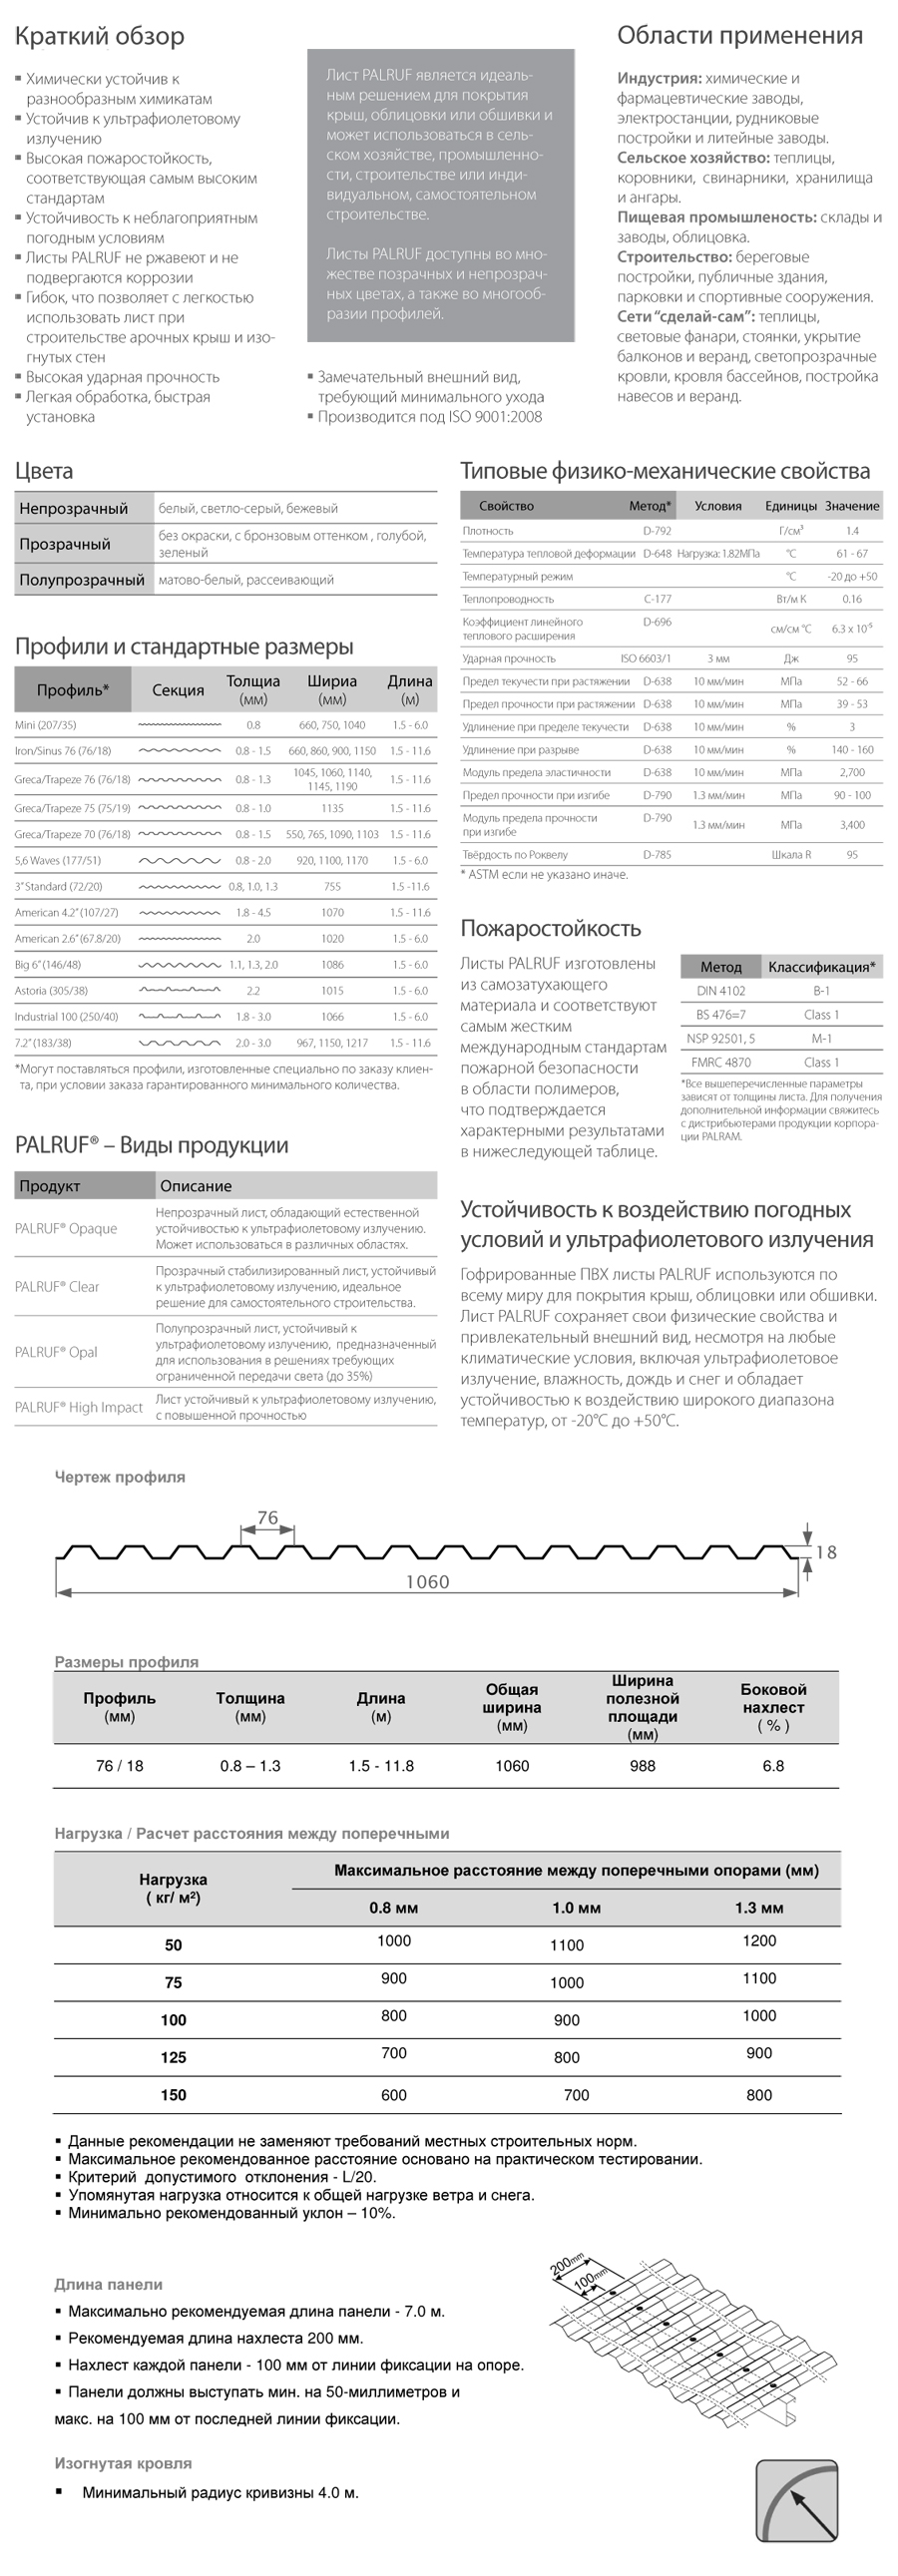 kharakteristiki-riflenogo-polikarbonata